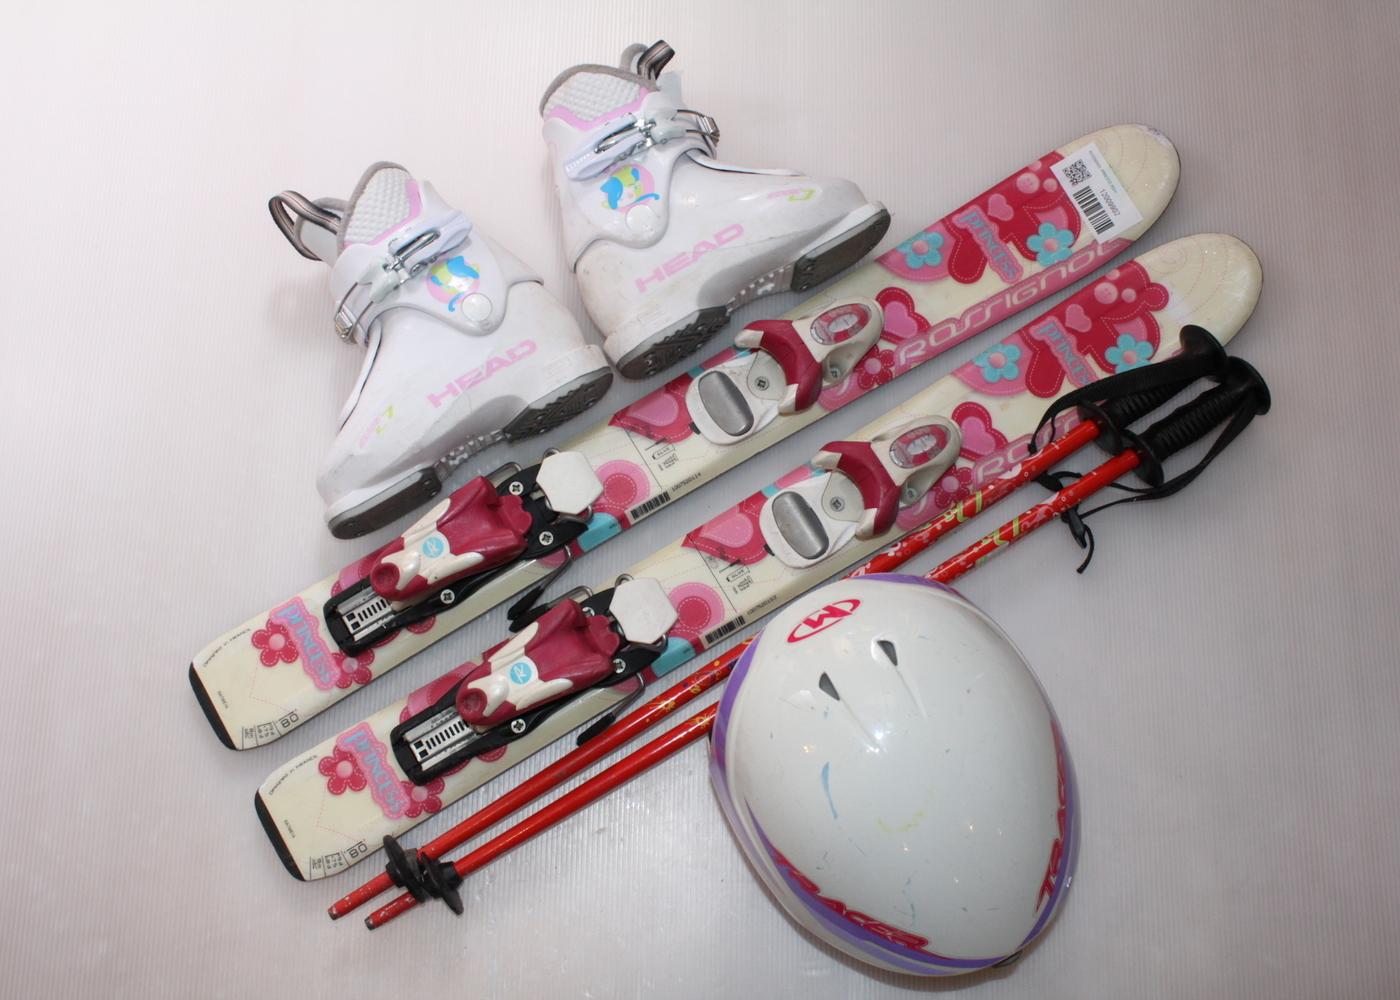 Dětské lyže ROSSIGNOL PRINCESS 80 cm + lyžáky  29EU + helma